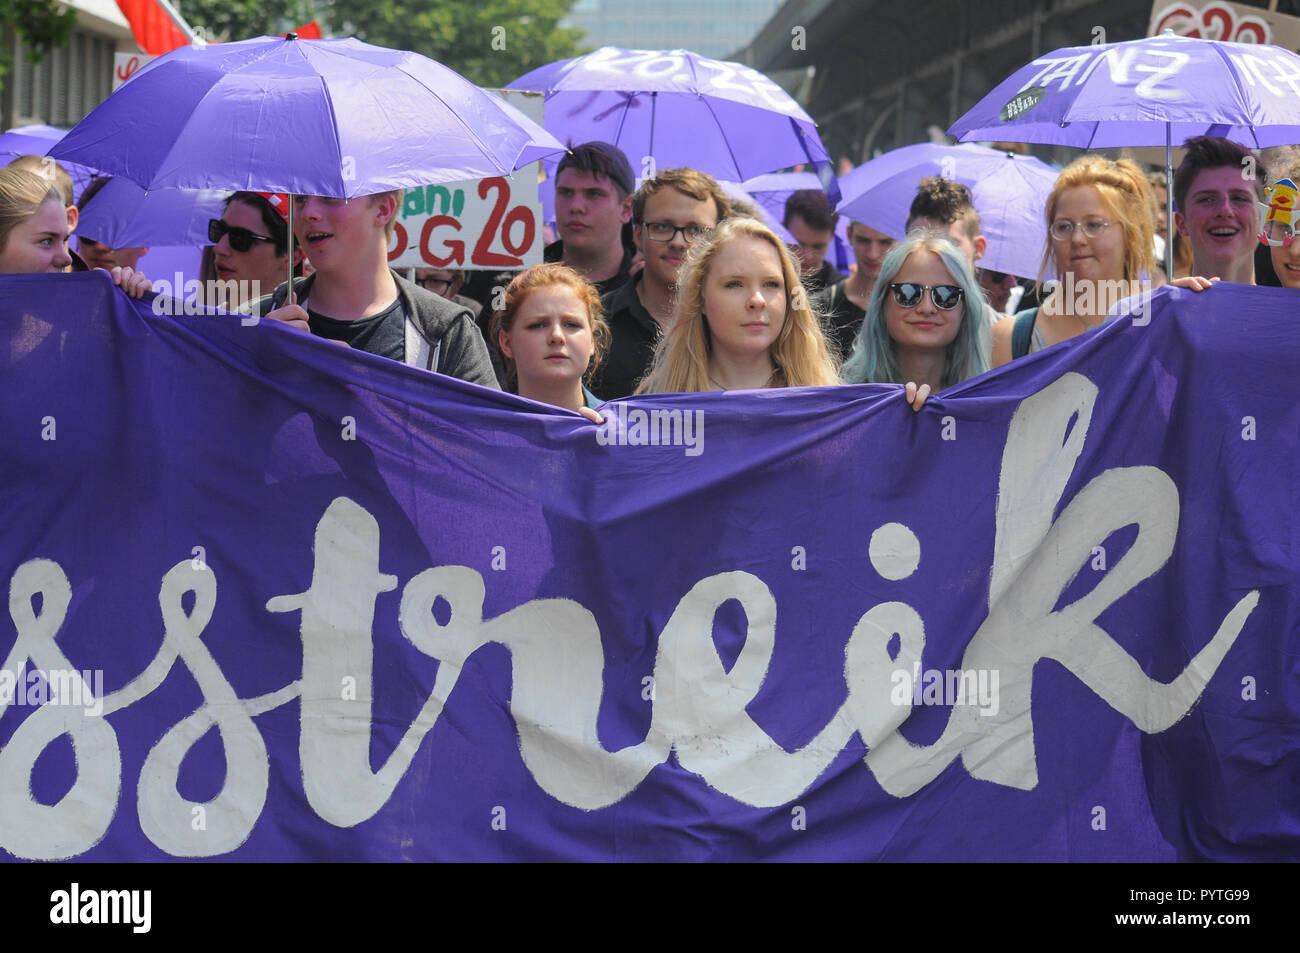 Anti G20 protest turn into violent urban riots in Hamburg, Germany - Stock Image